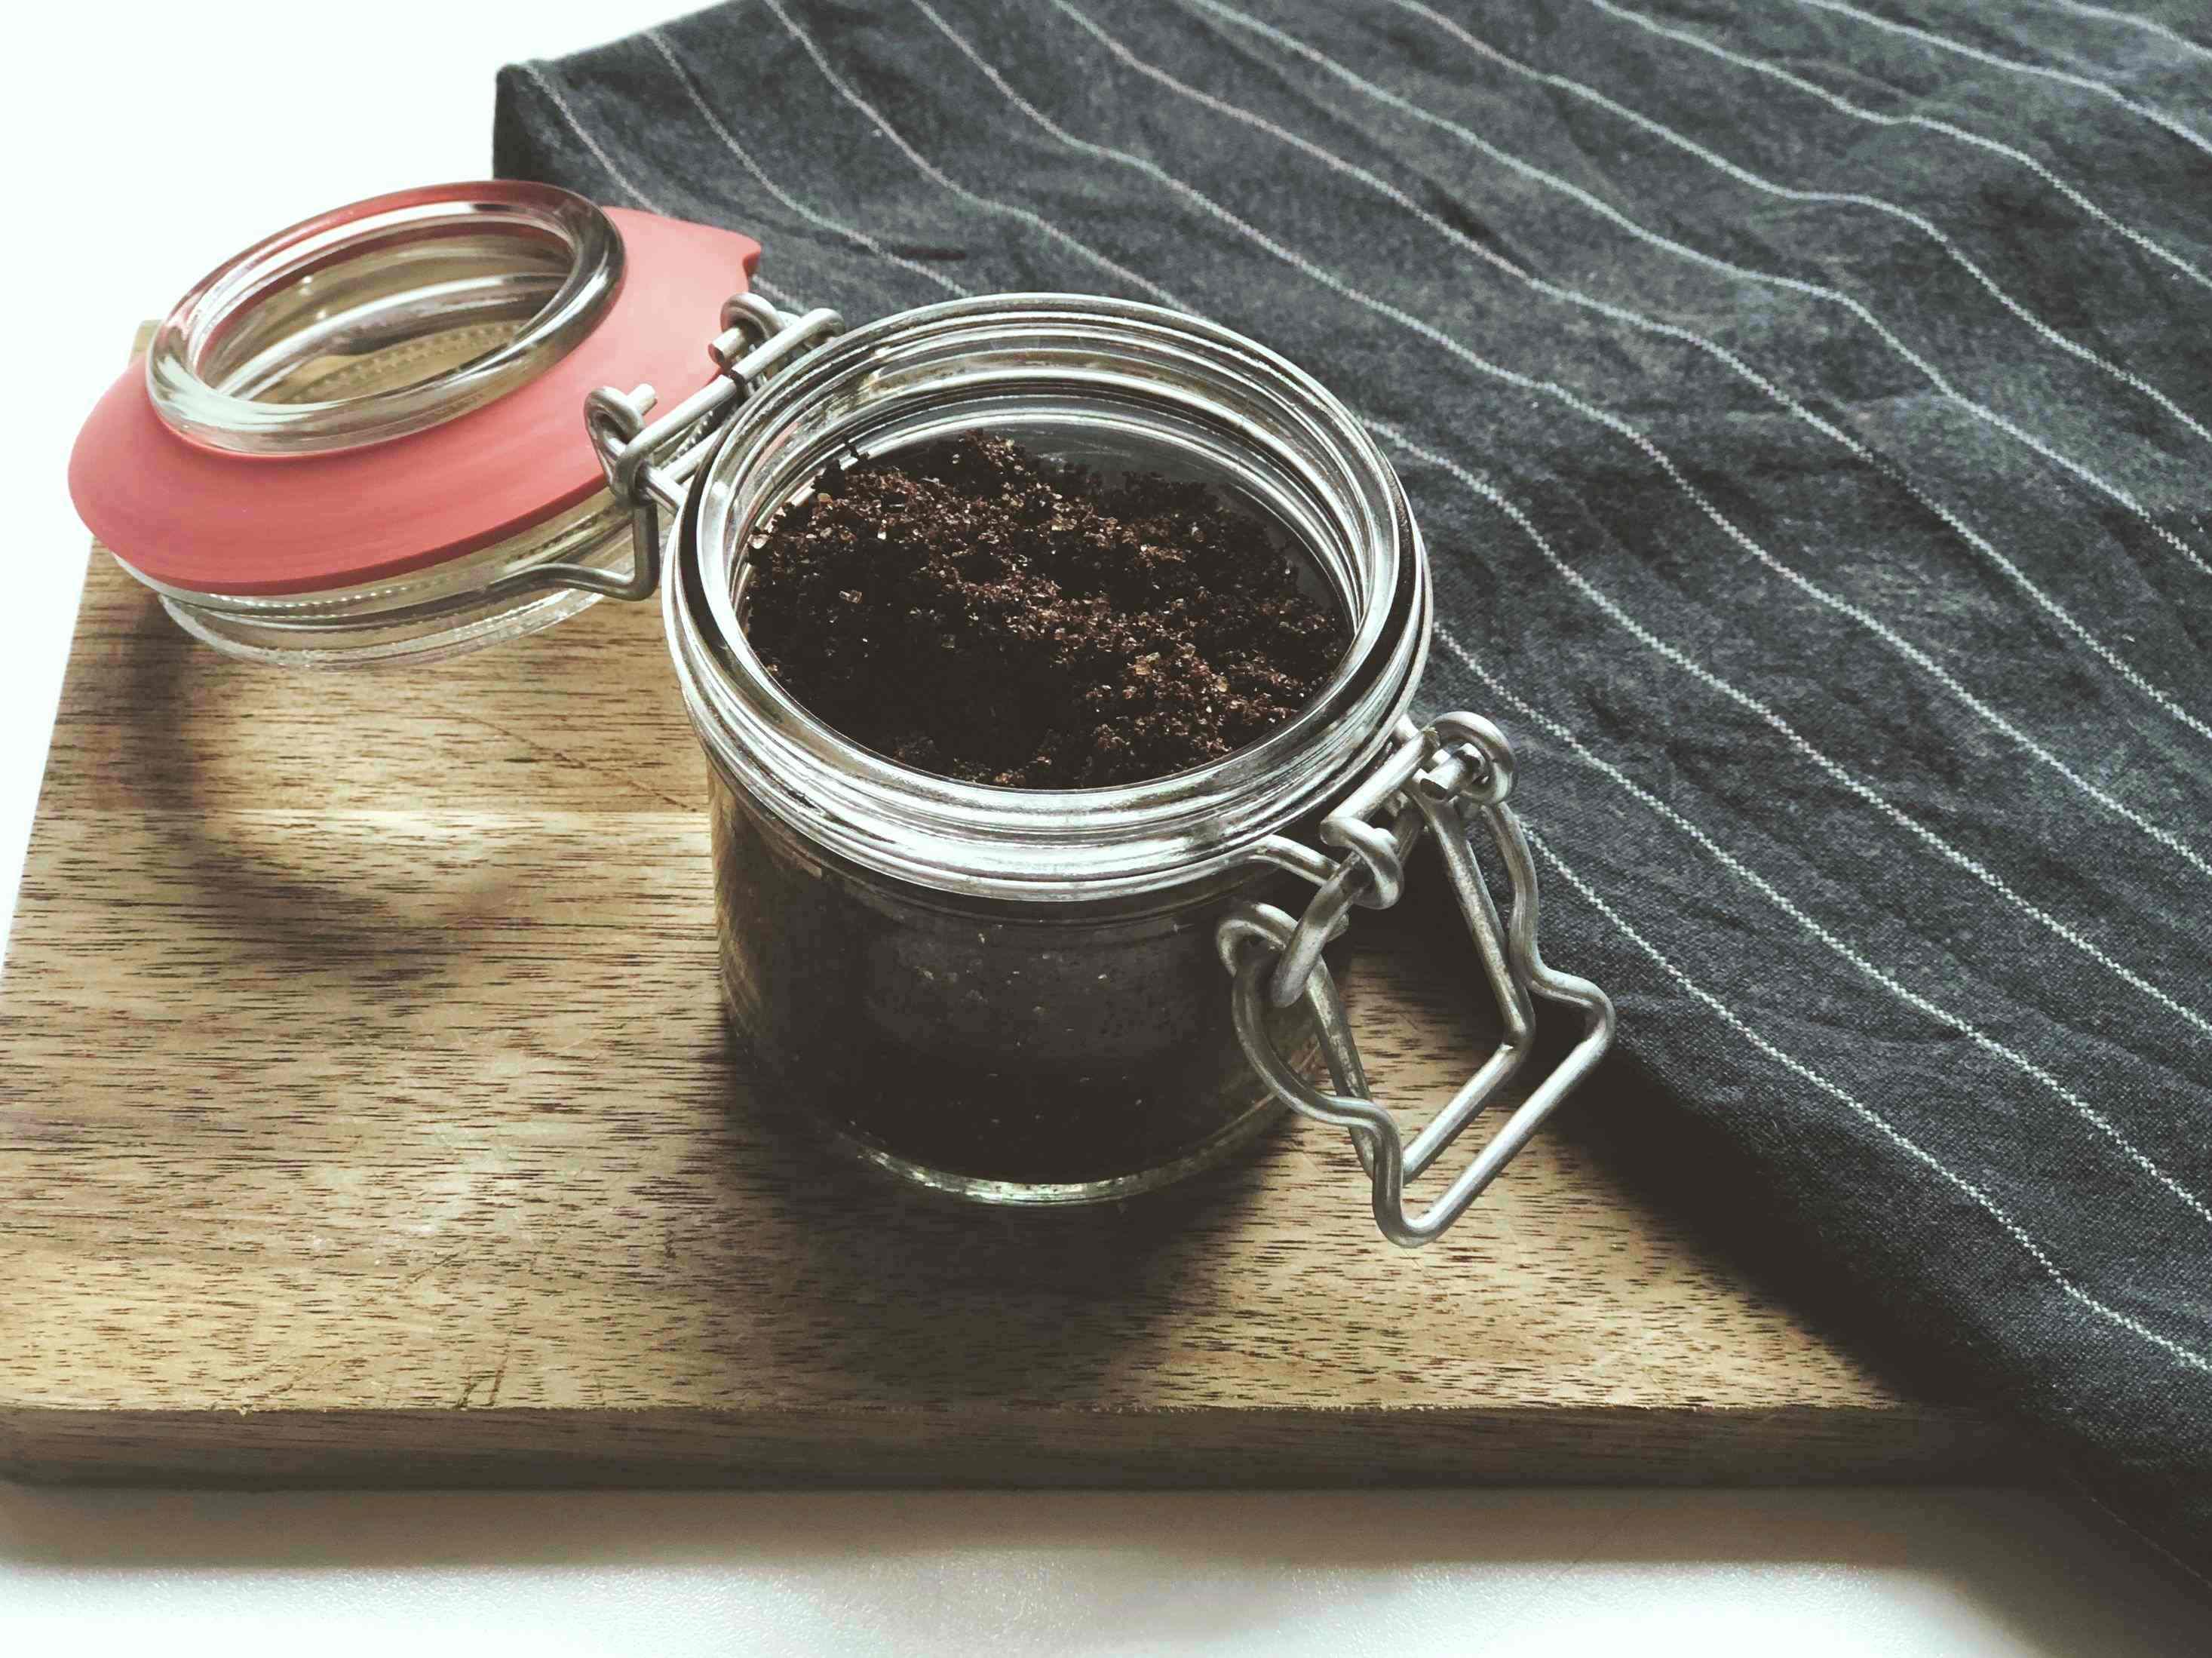 DIY-Kaffee-Peeling-Maske-Weckglas-Umwelt-Beauty-Oh-Yes-Yoga